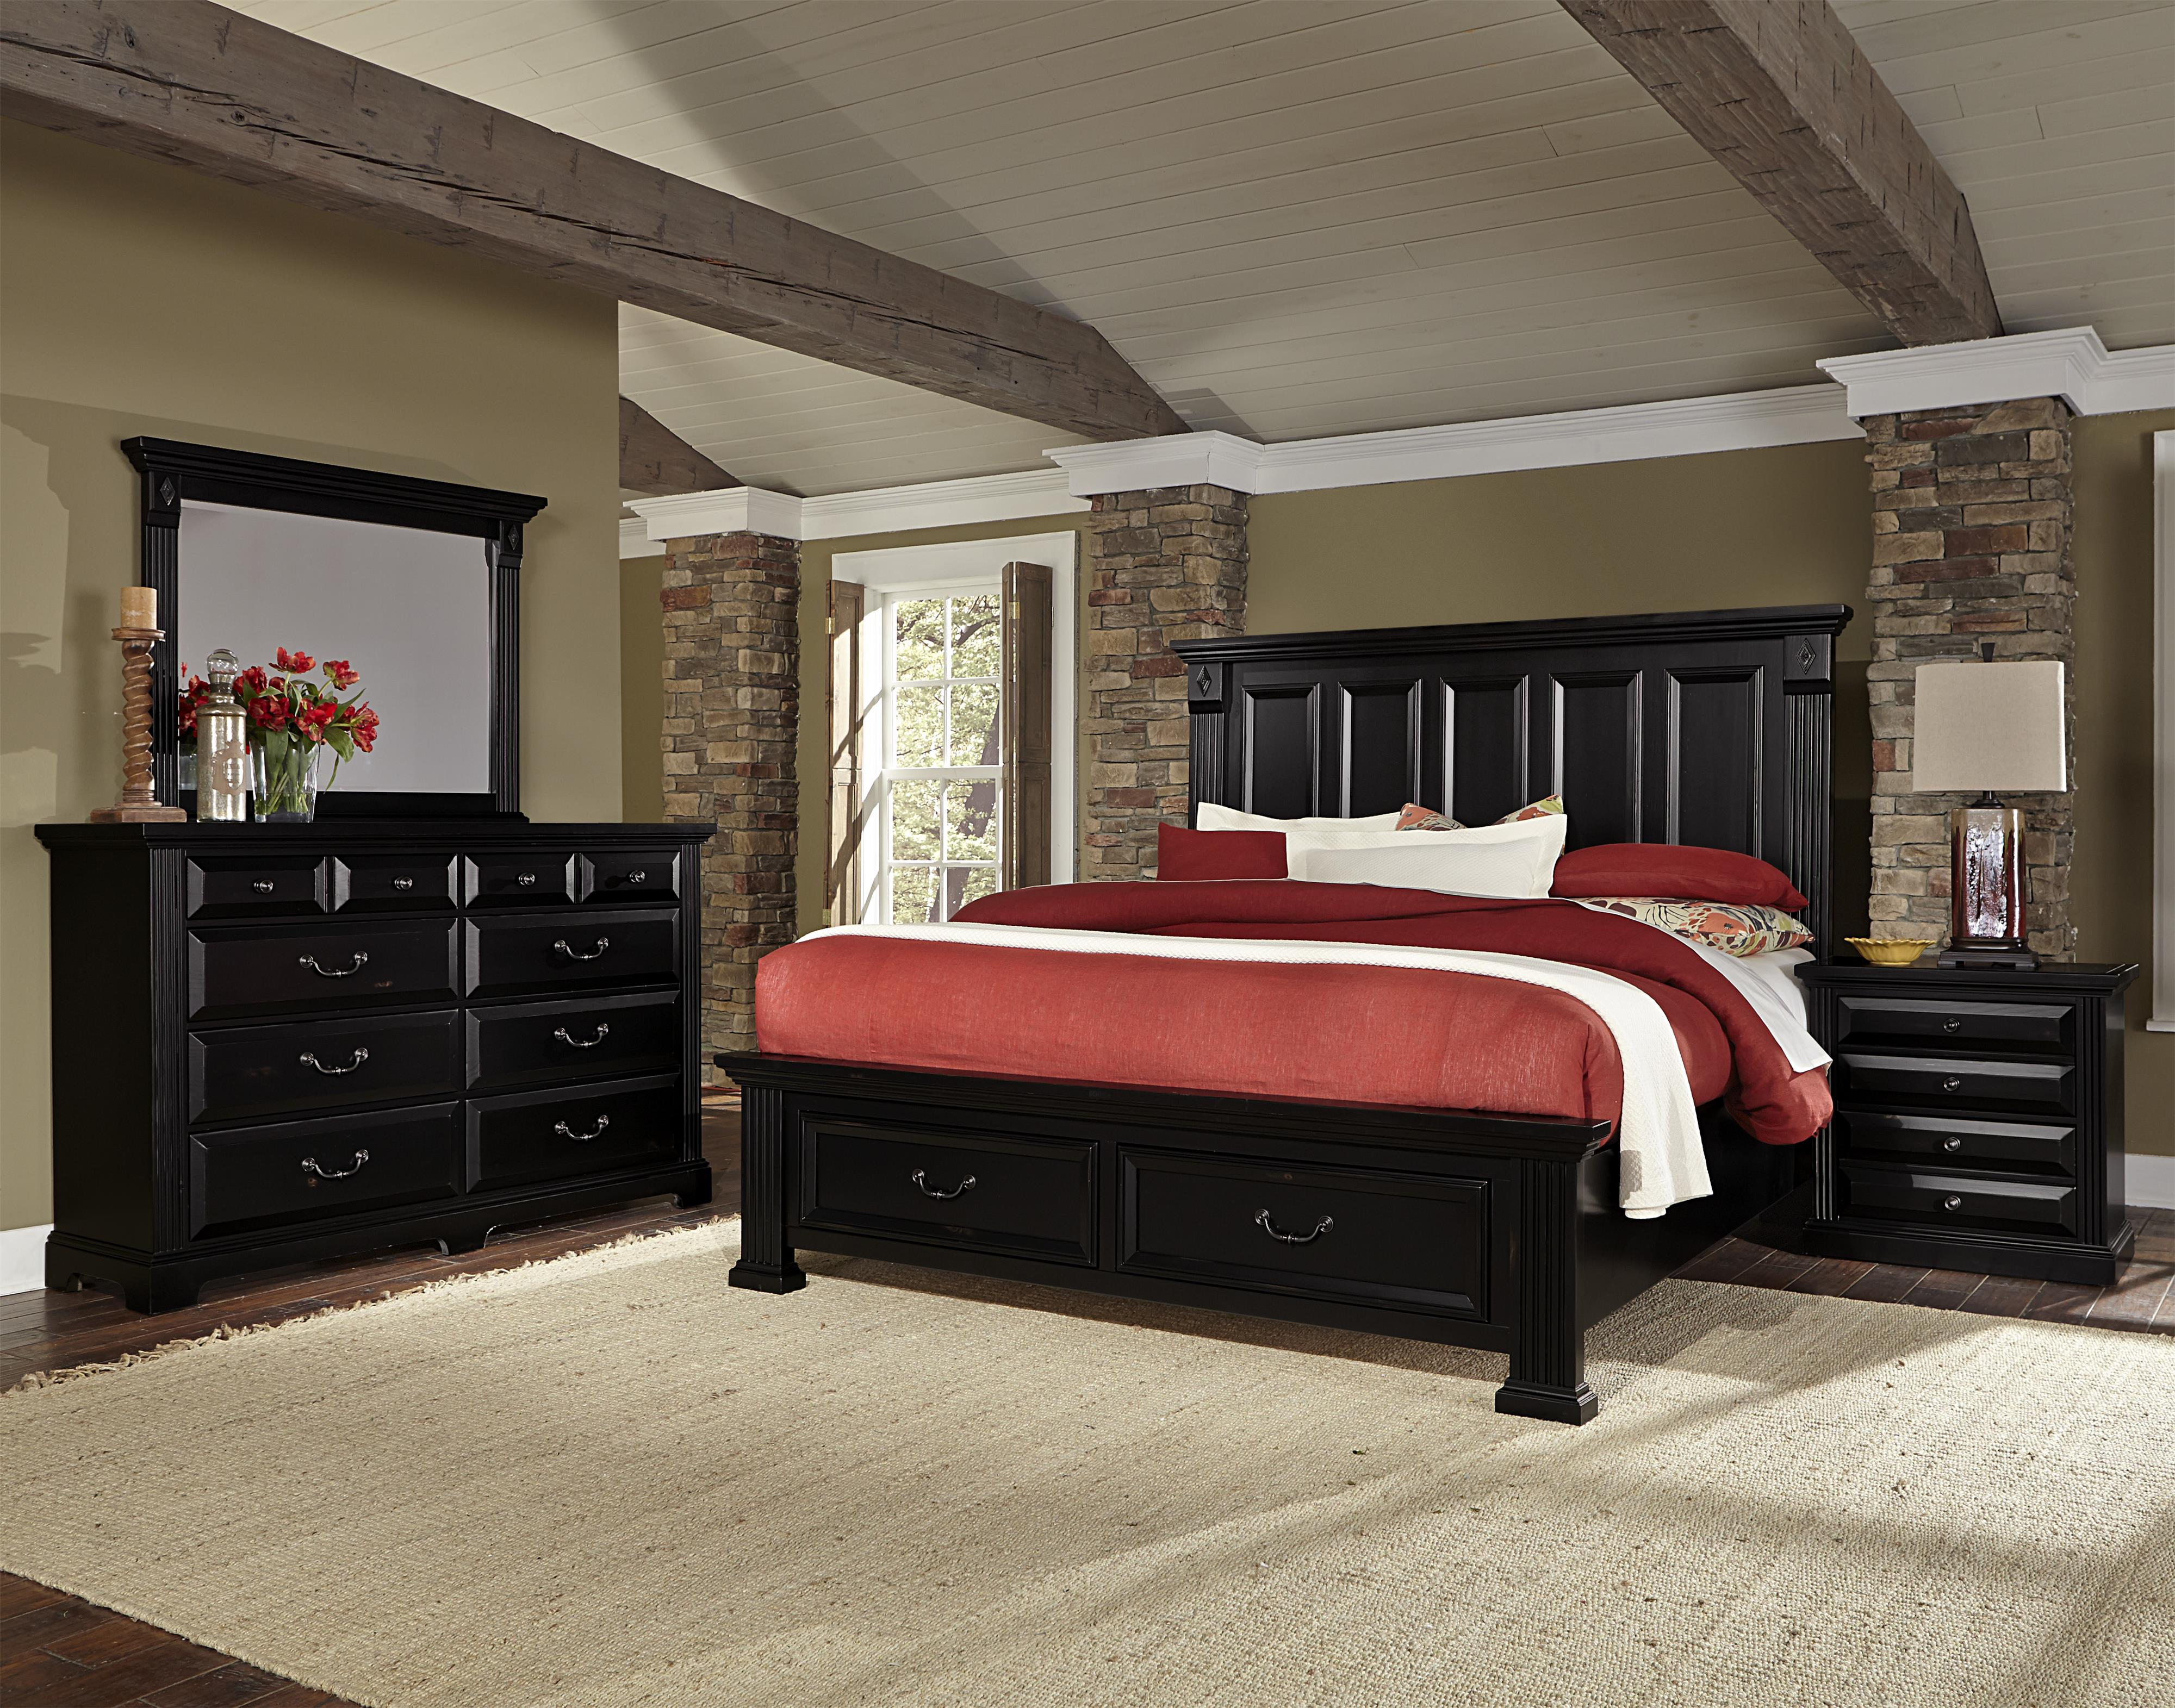 Vaughan Bassett Woodlands King Bedroom Group - Item Number: BB99 K Bedroom Group 4